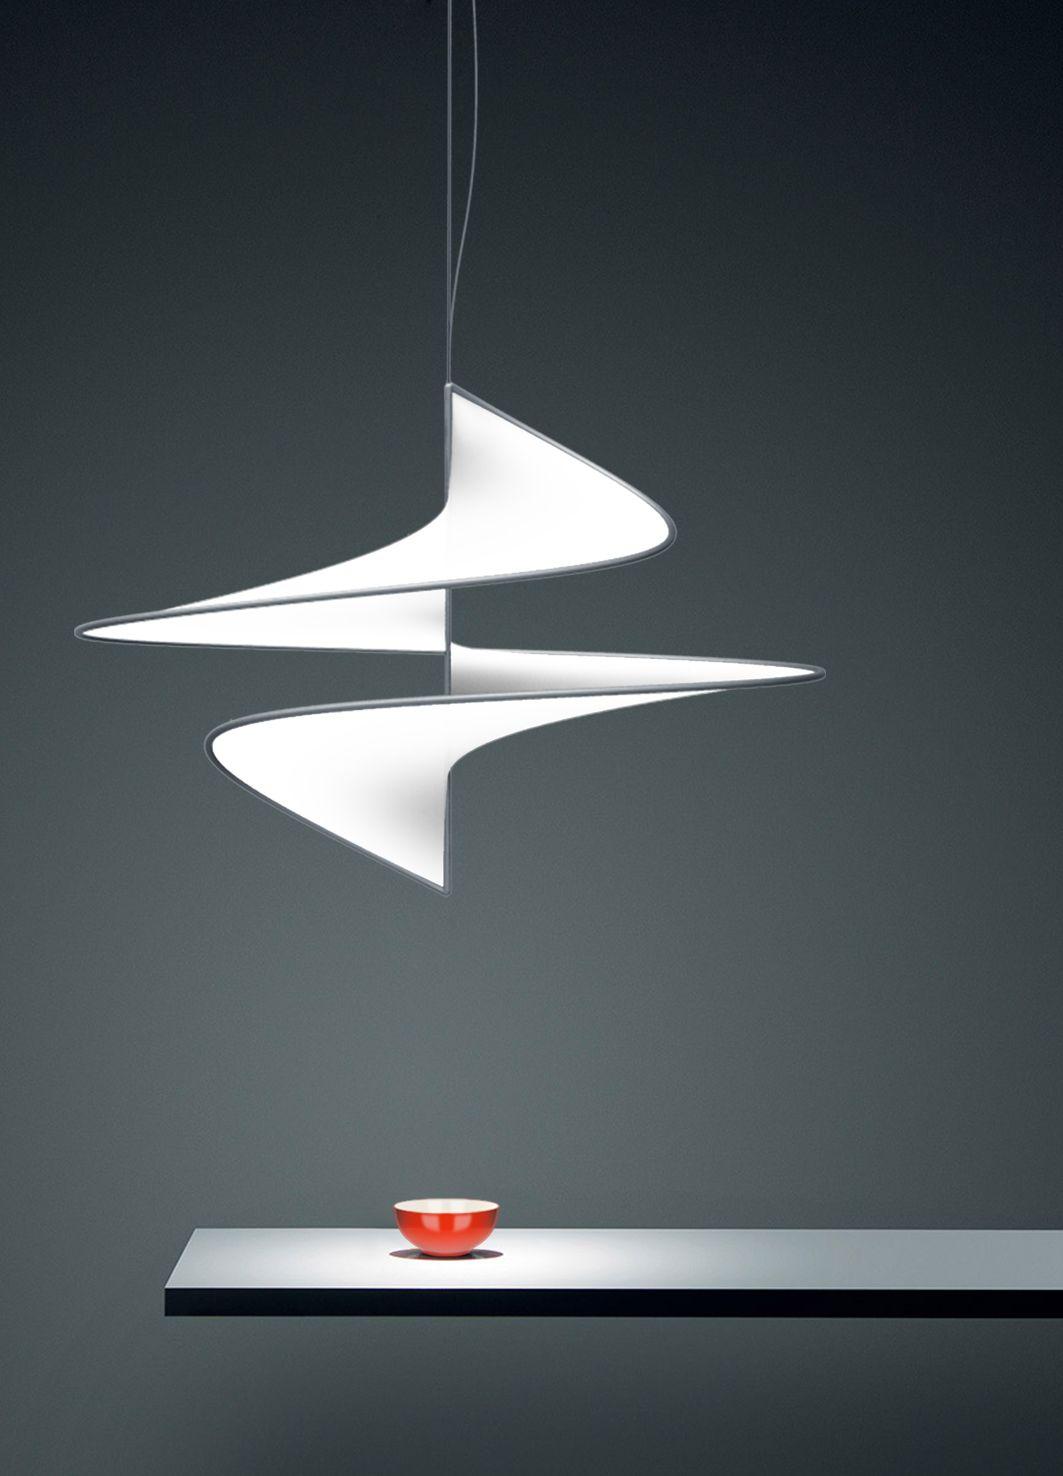 Pendant Lamp By Jeon Hye Jin, Kim Eun Kyung, Cho Seong Hee, 2017